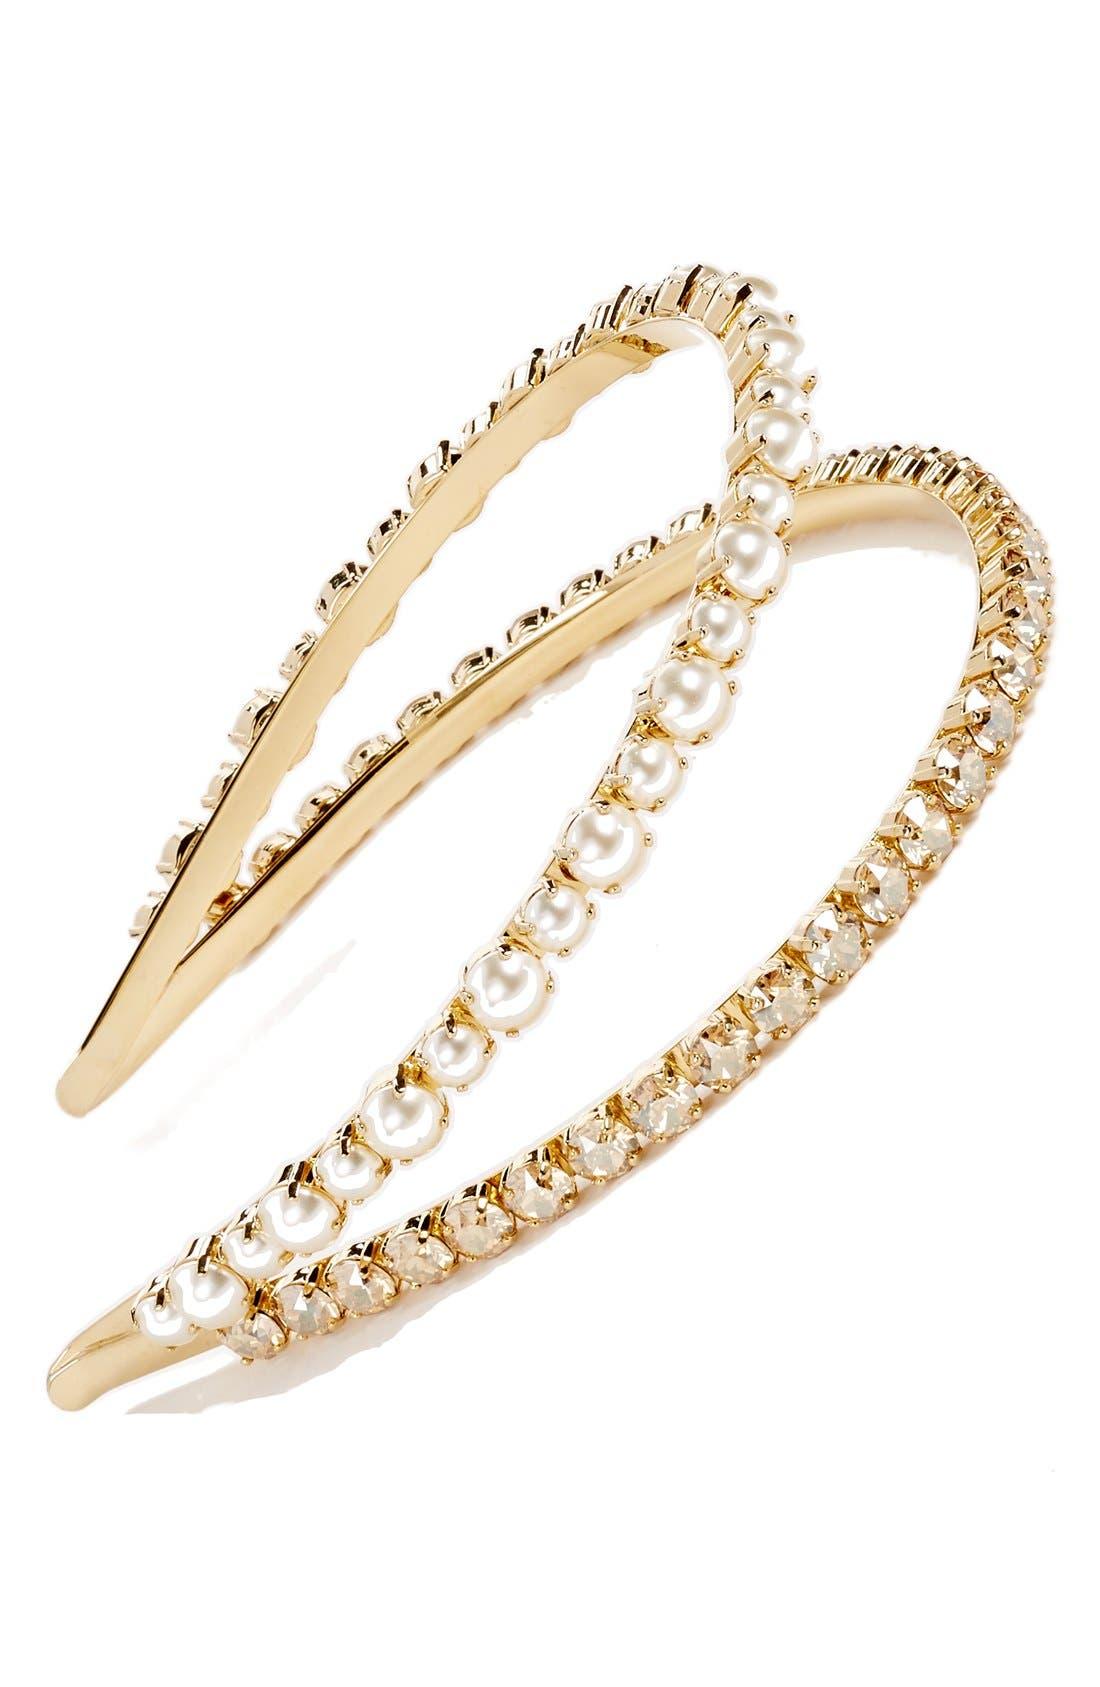 Main Image - Miu Miu 'Classic' Bead & Crystal Double Headband